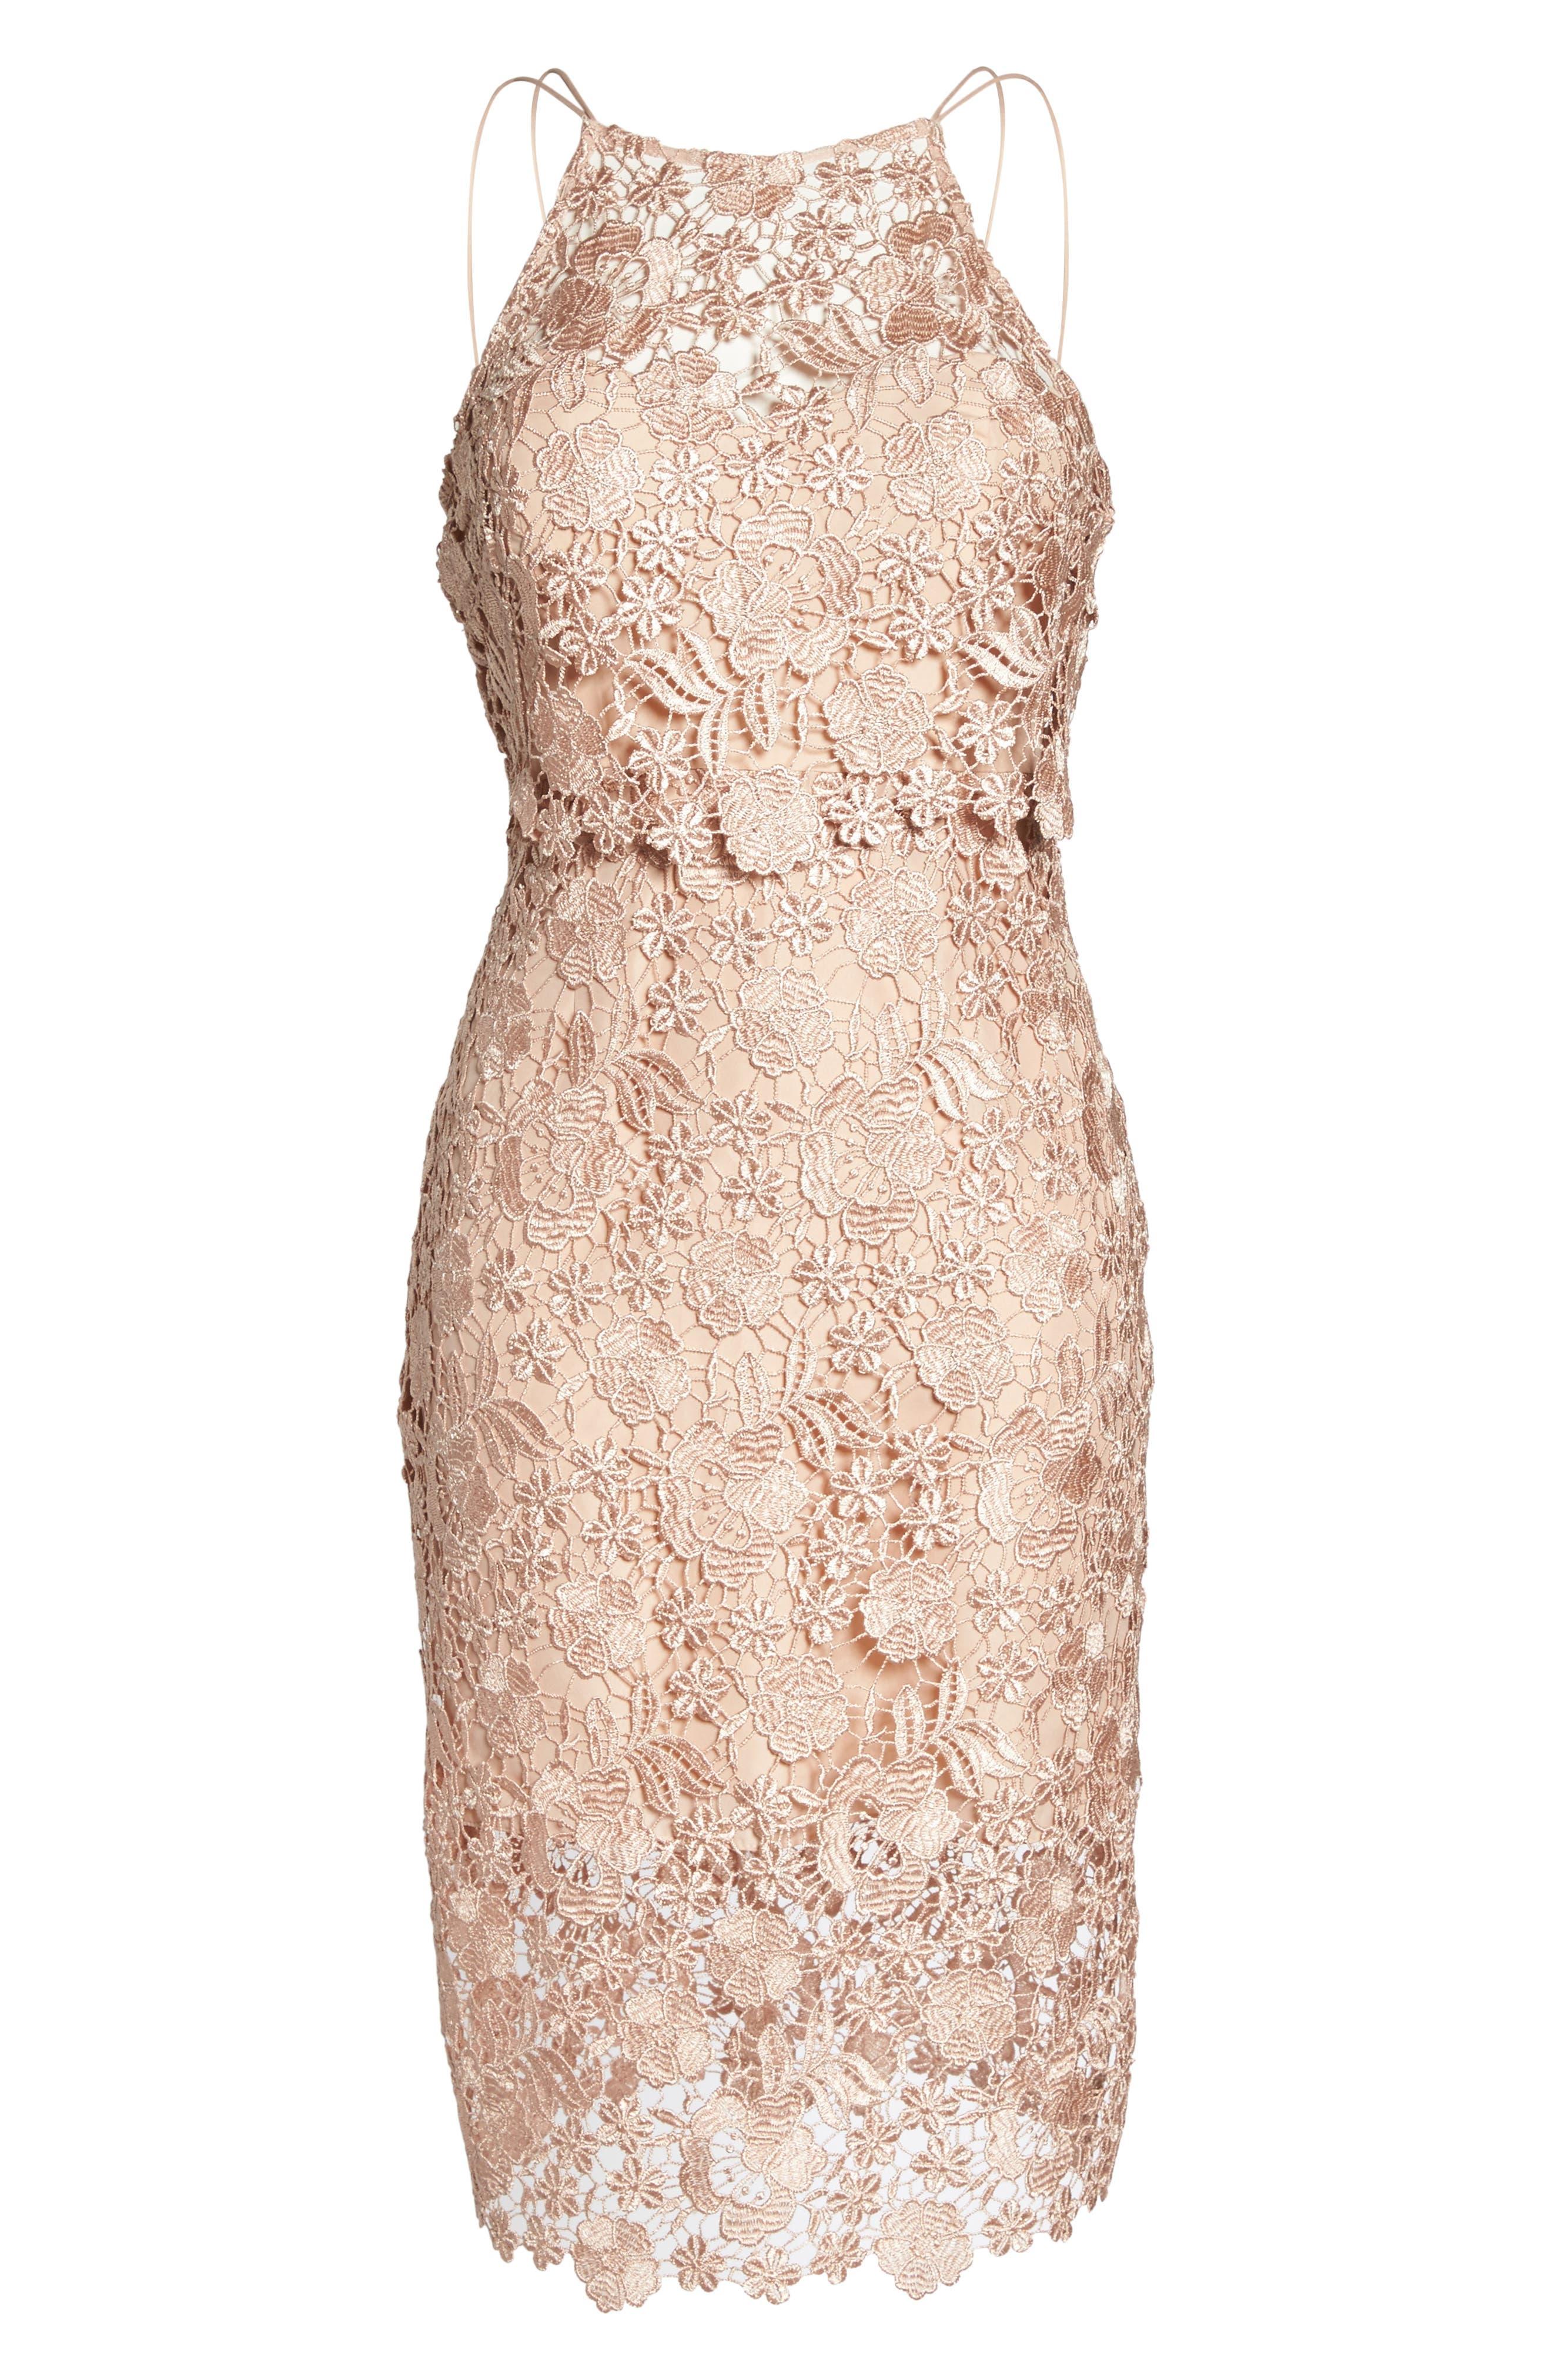 Freya Lace Sheath Dress,                             Alternate thumbnail 6, color,                             Cameo Pink